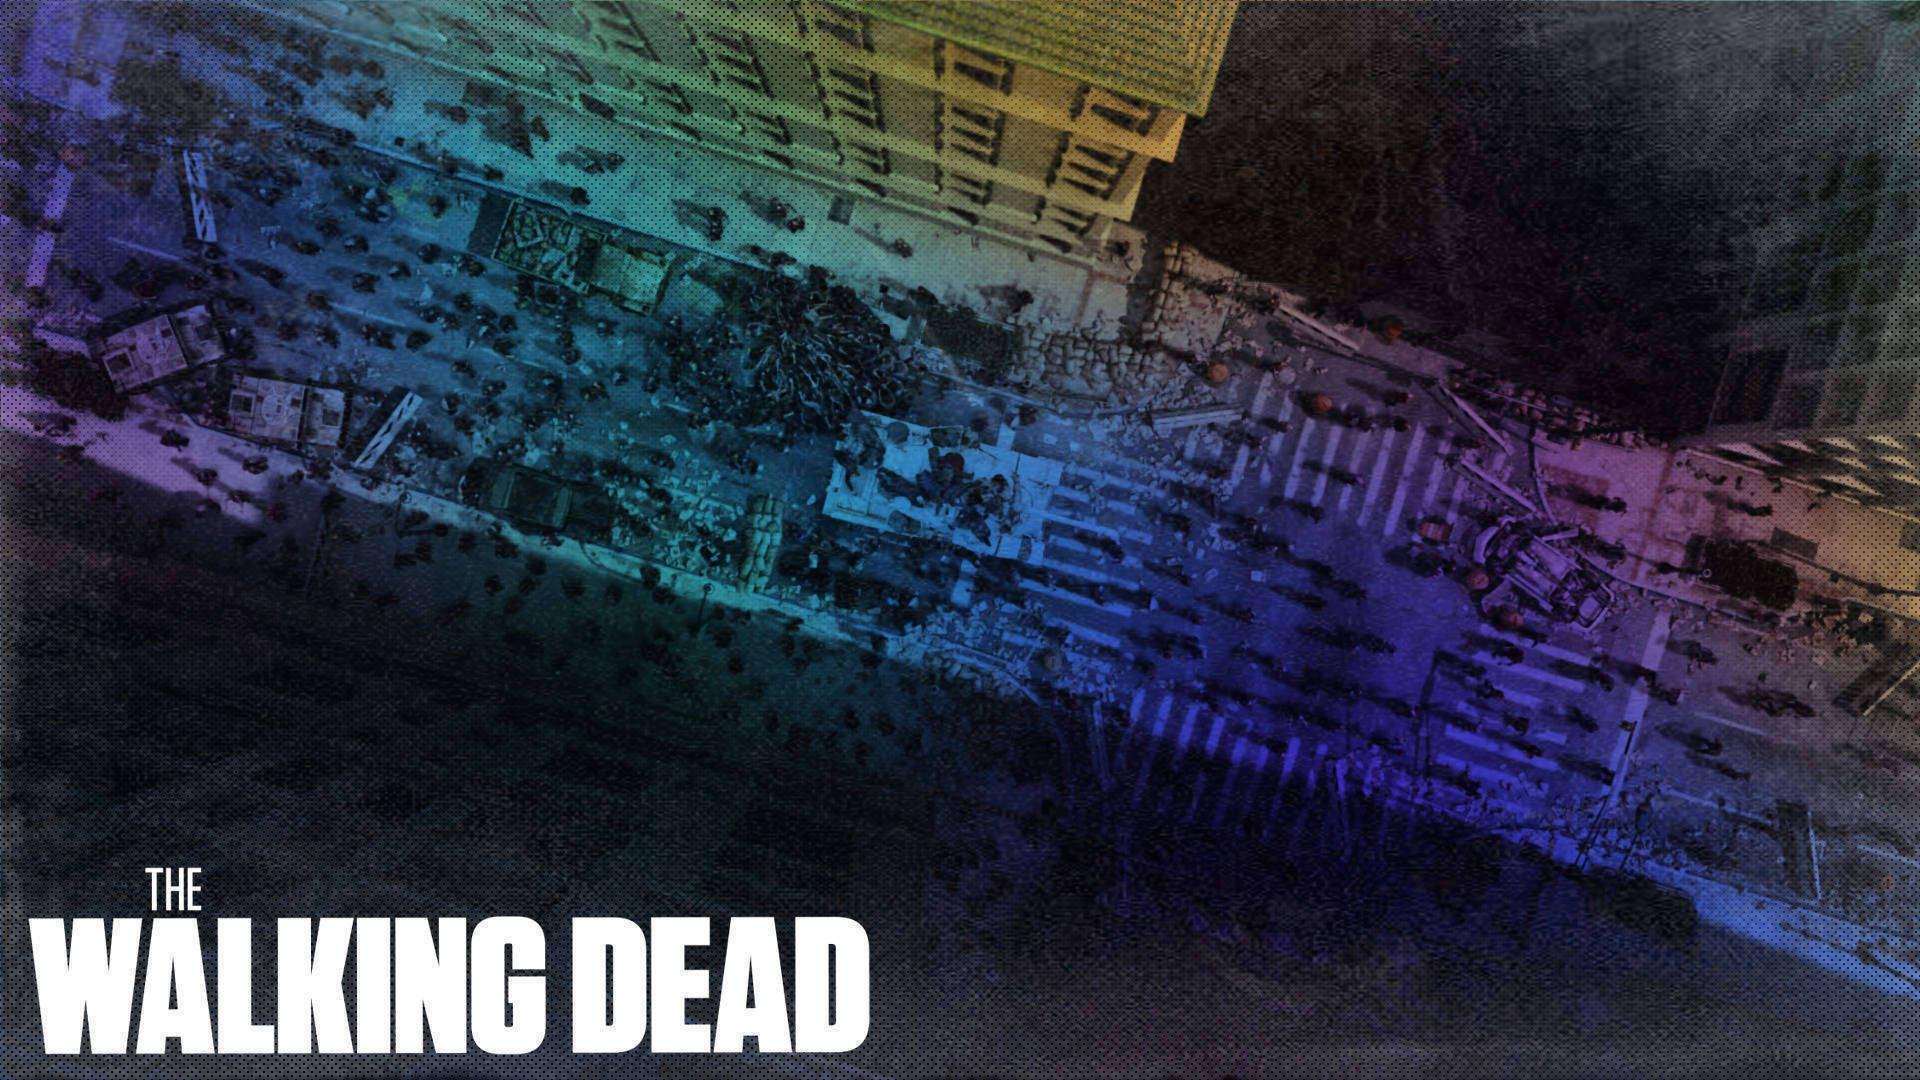 Fondos De Pantalla Wallpapers Gratis The Walking Dead Hd